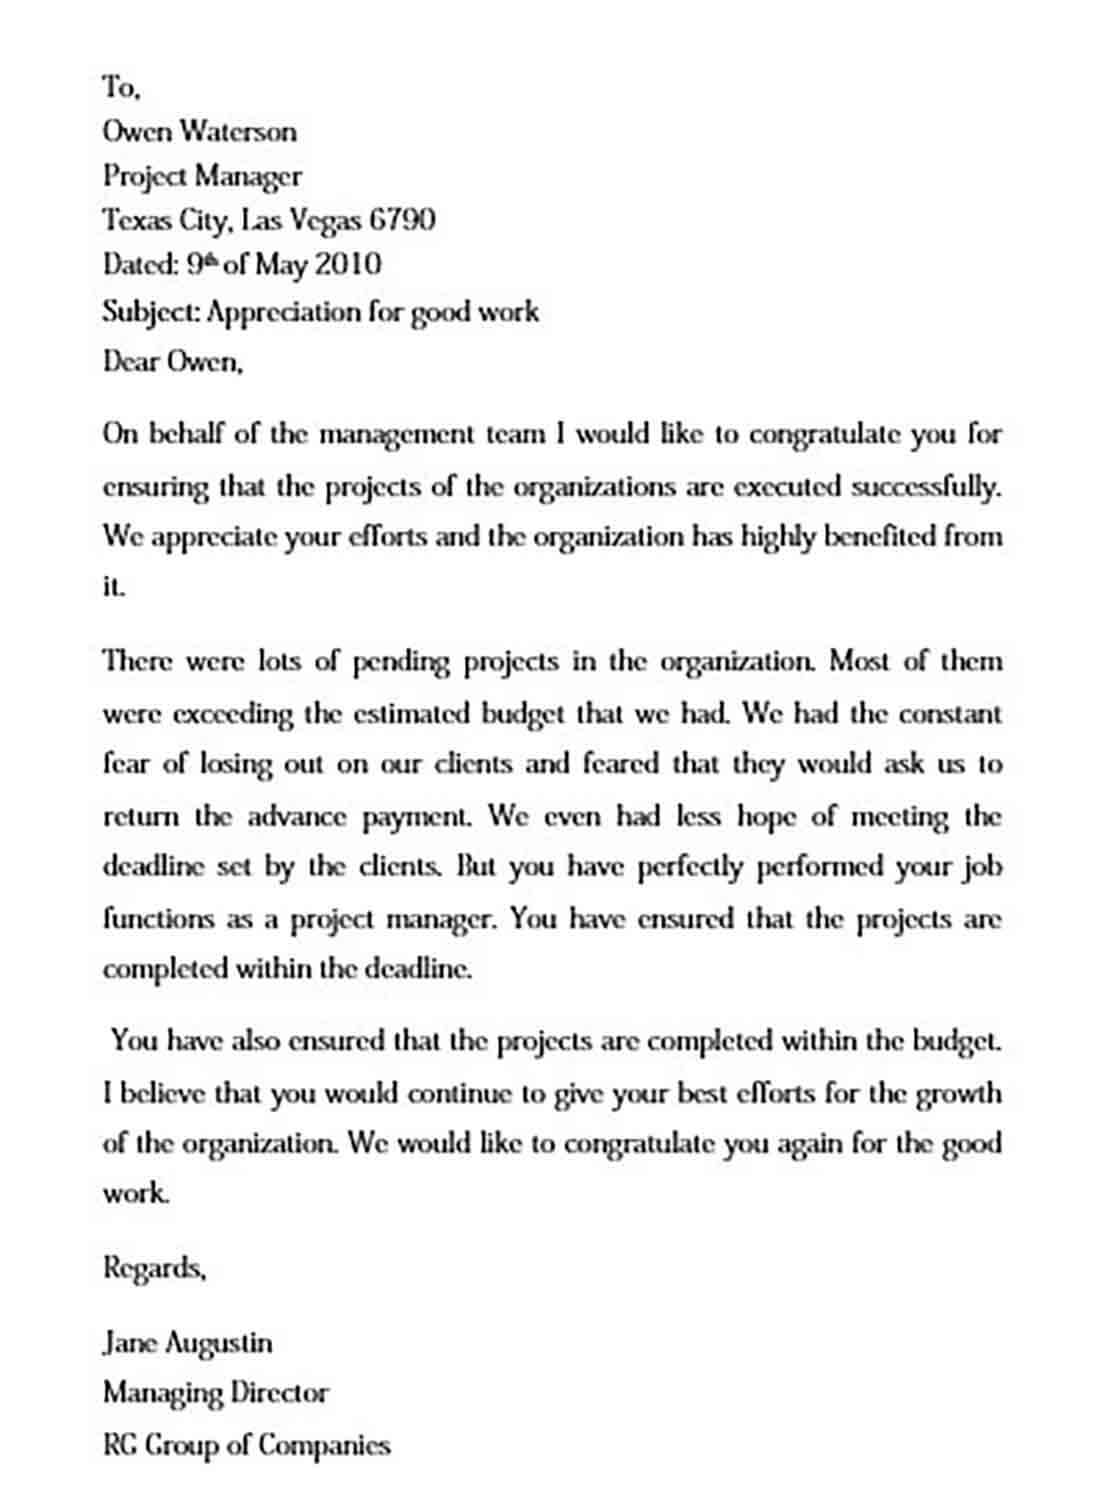 appreciation letter for good work